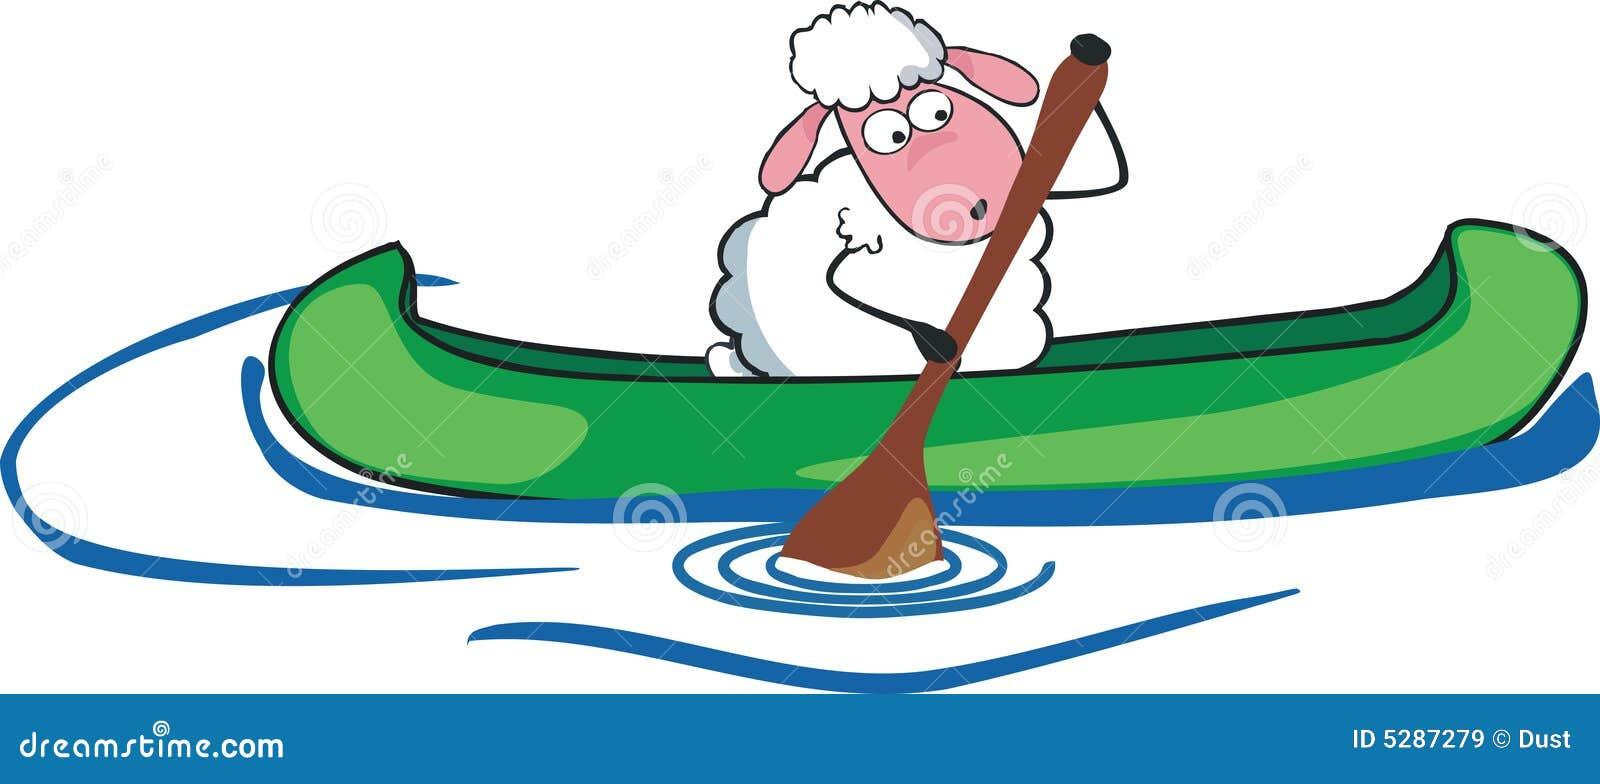 Sheep in canoe stock vector. Illustration of lamb, rowboat ...